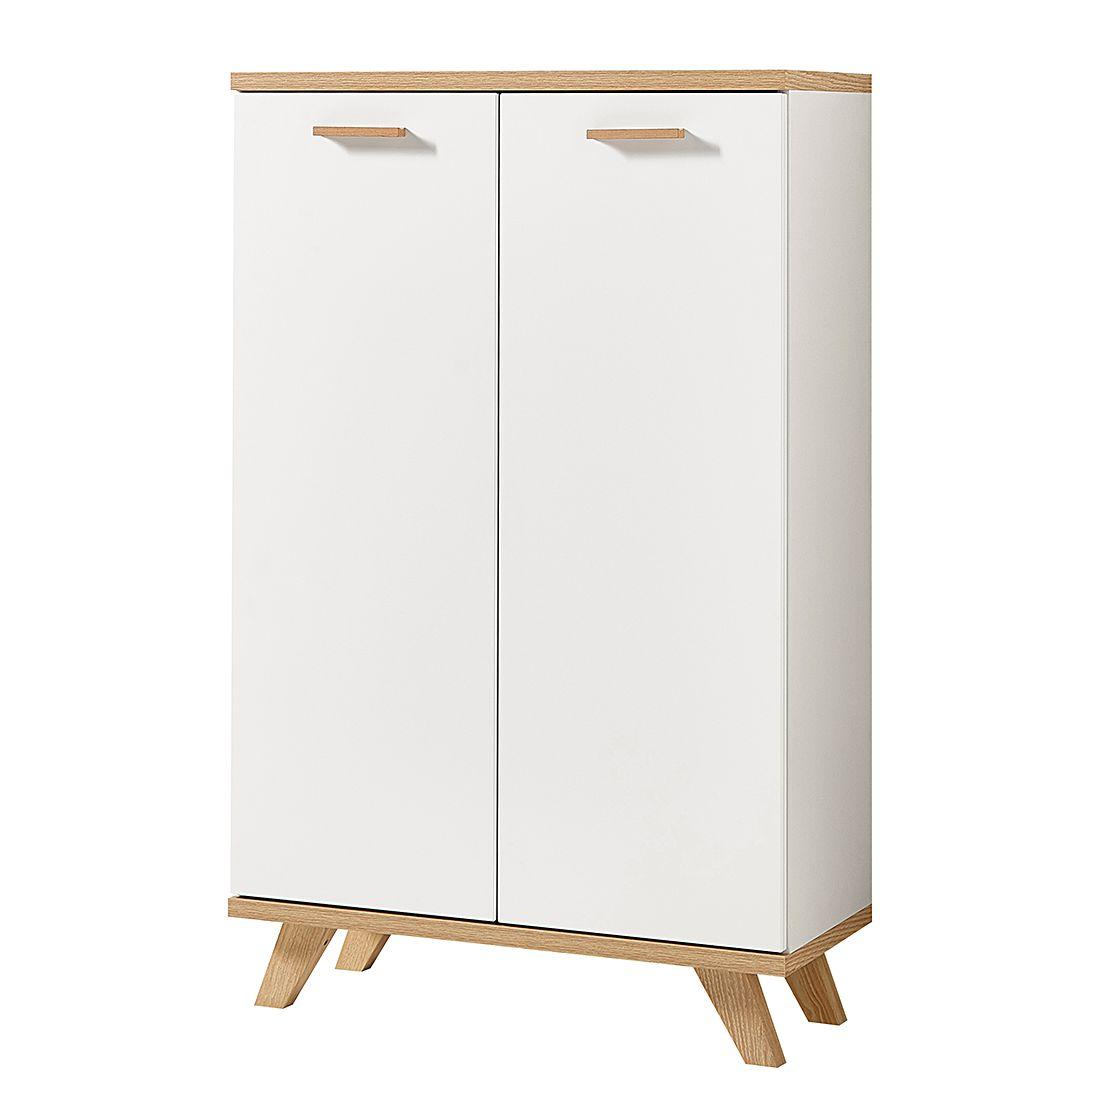 Armoire dossiers neston i armoire bureau bureau bois - Transformer une armoire en bureau ...